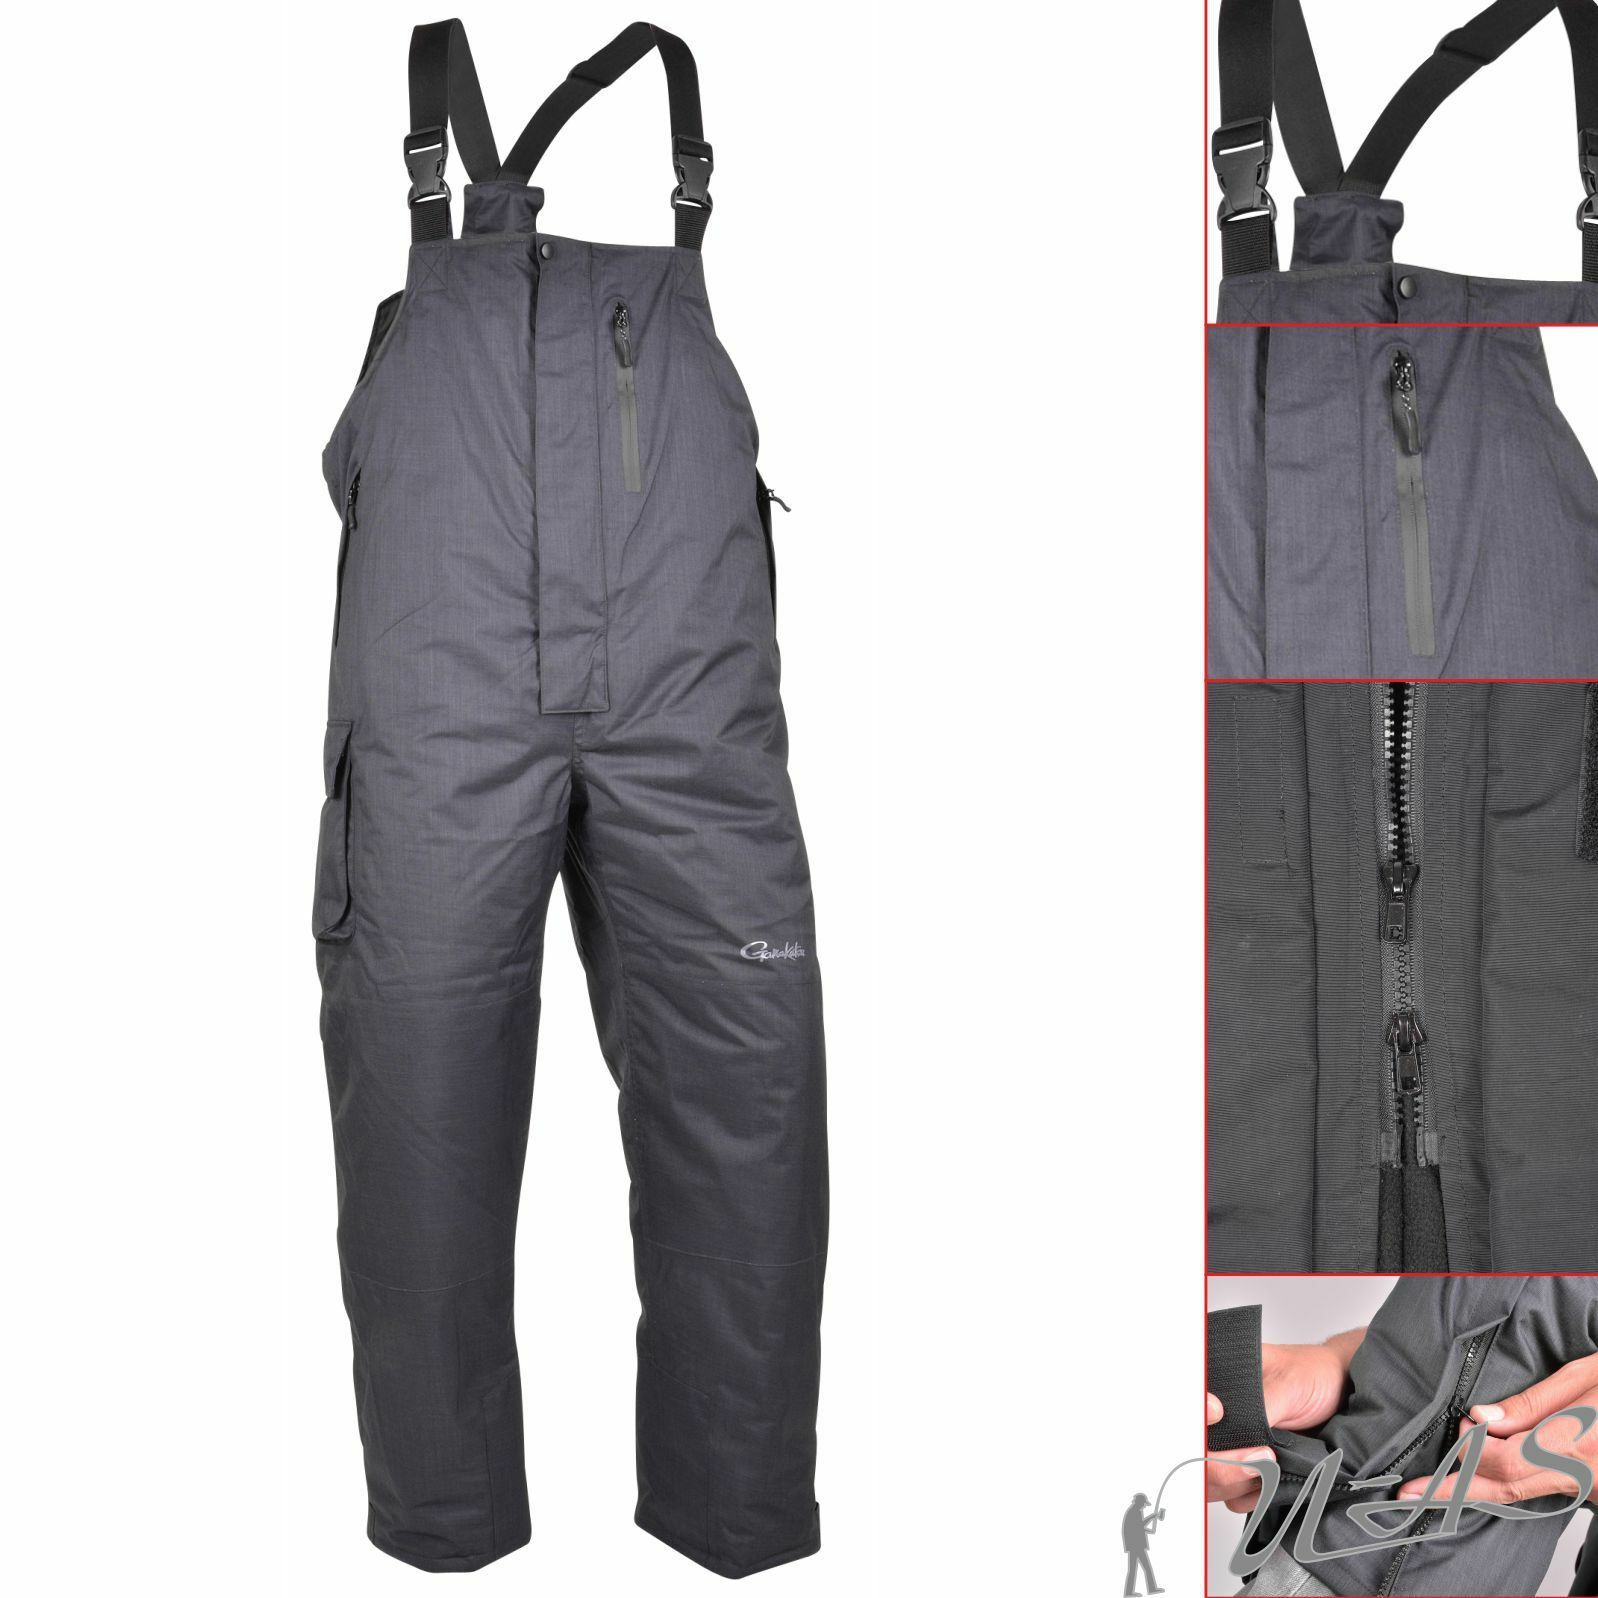 Spro Gamakatsu Thermal Pants Hose Gr. XL Zu Thermoanzug Thermal Angelanzug Kva